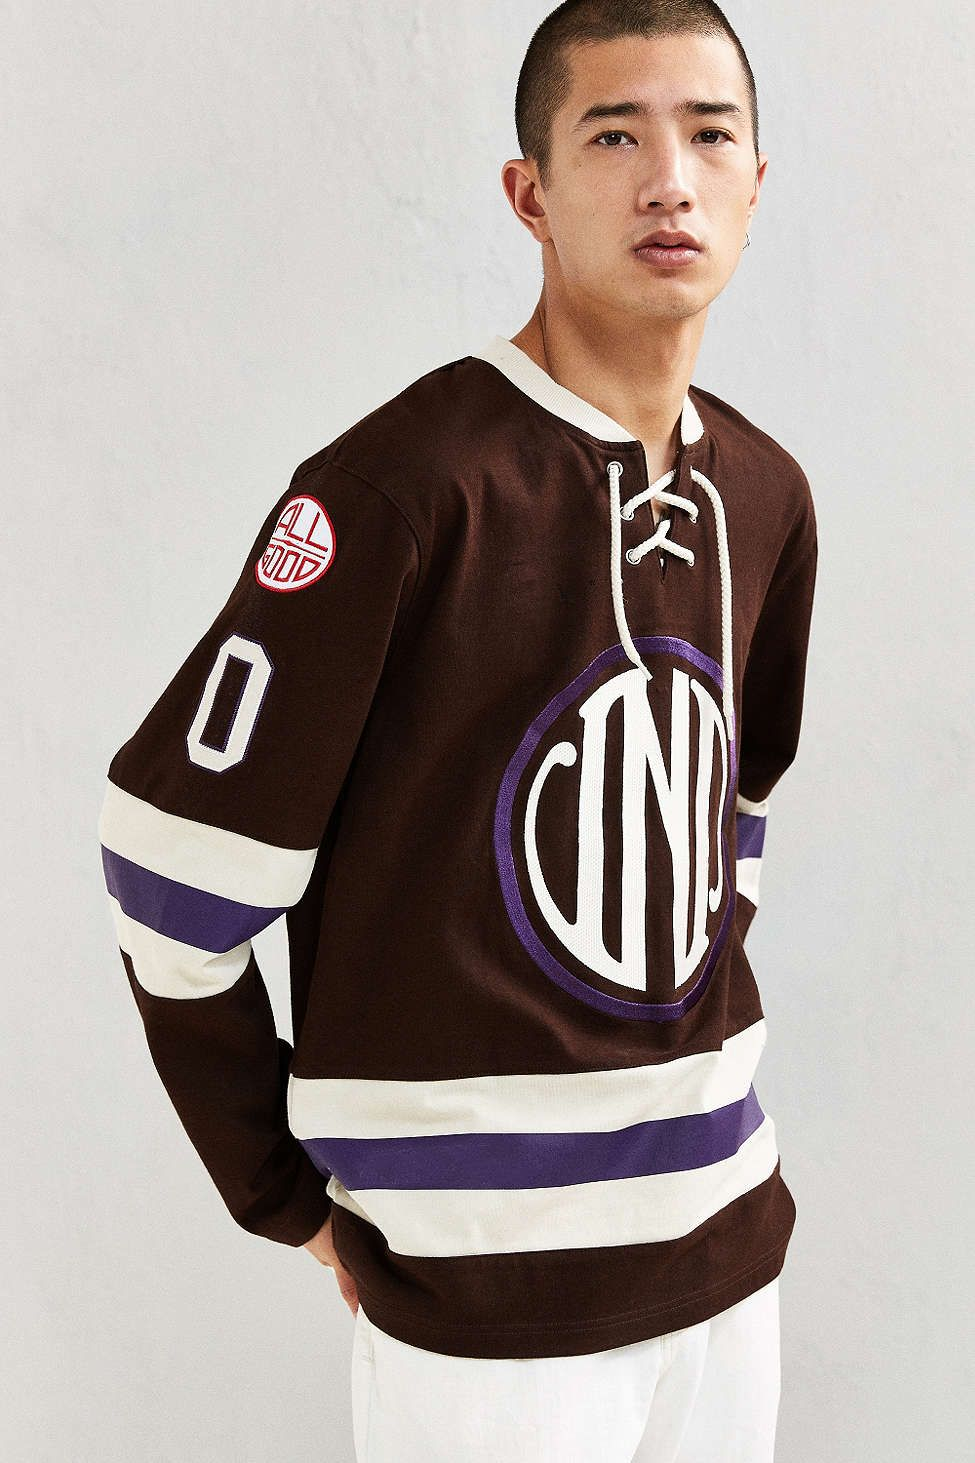 33def8b8c Undefeated Enforcer Hockey Jersey | Streetwear | Jersey fashion ...